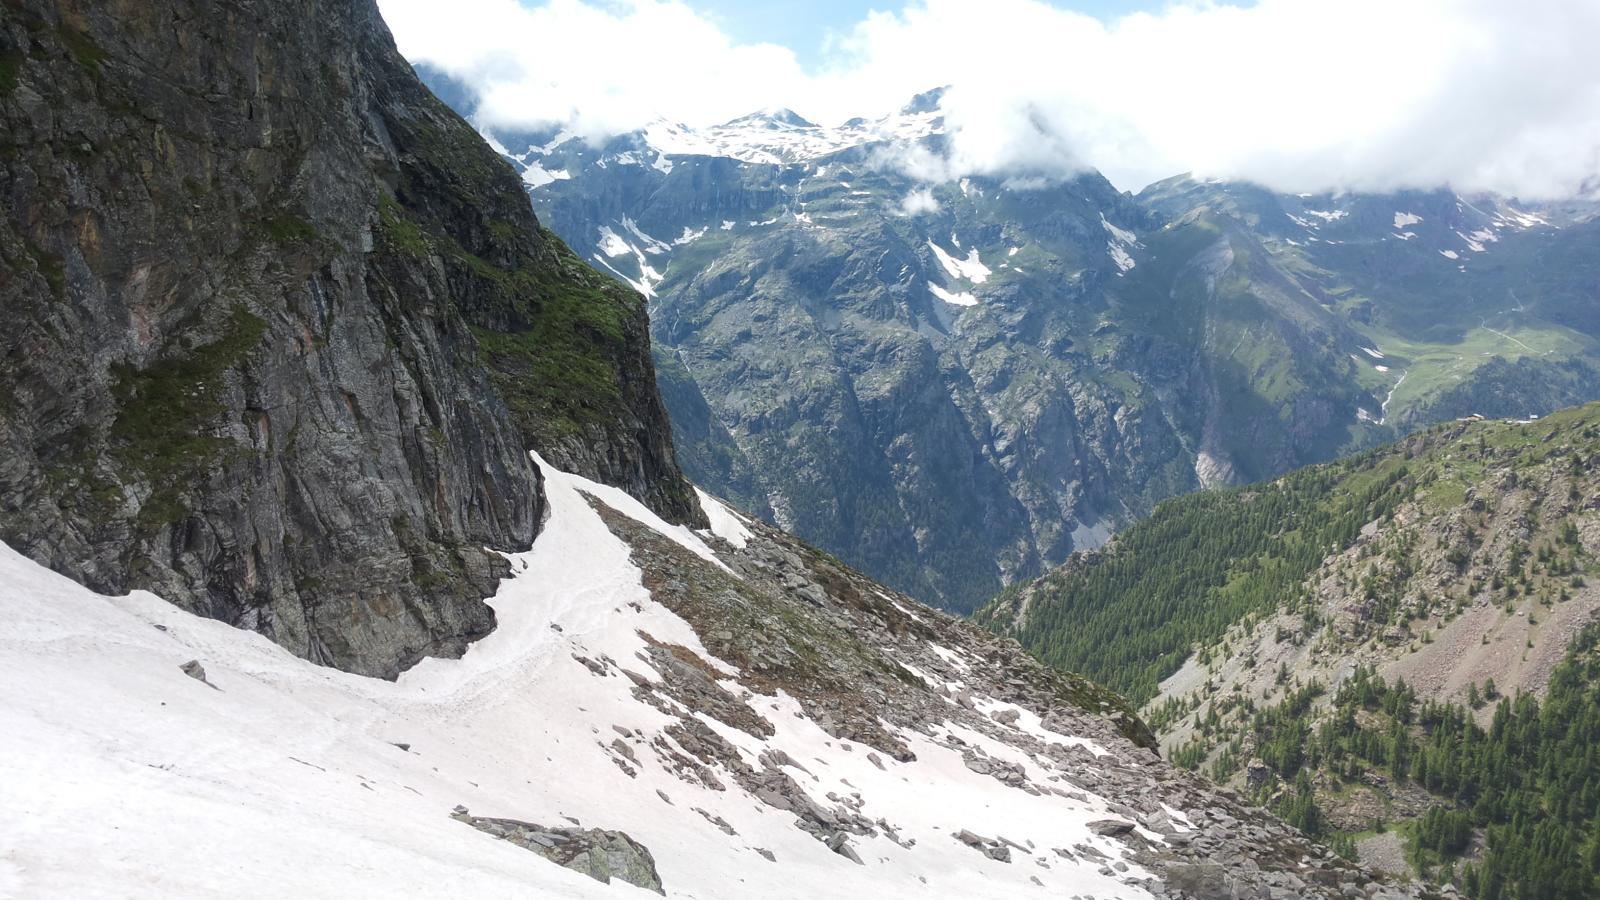 traversata verso Gabiet, presente ancora un nevaio importante